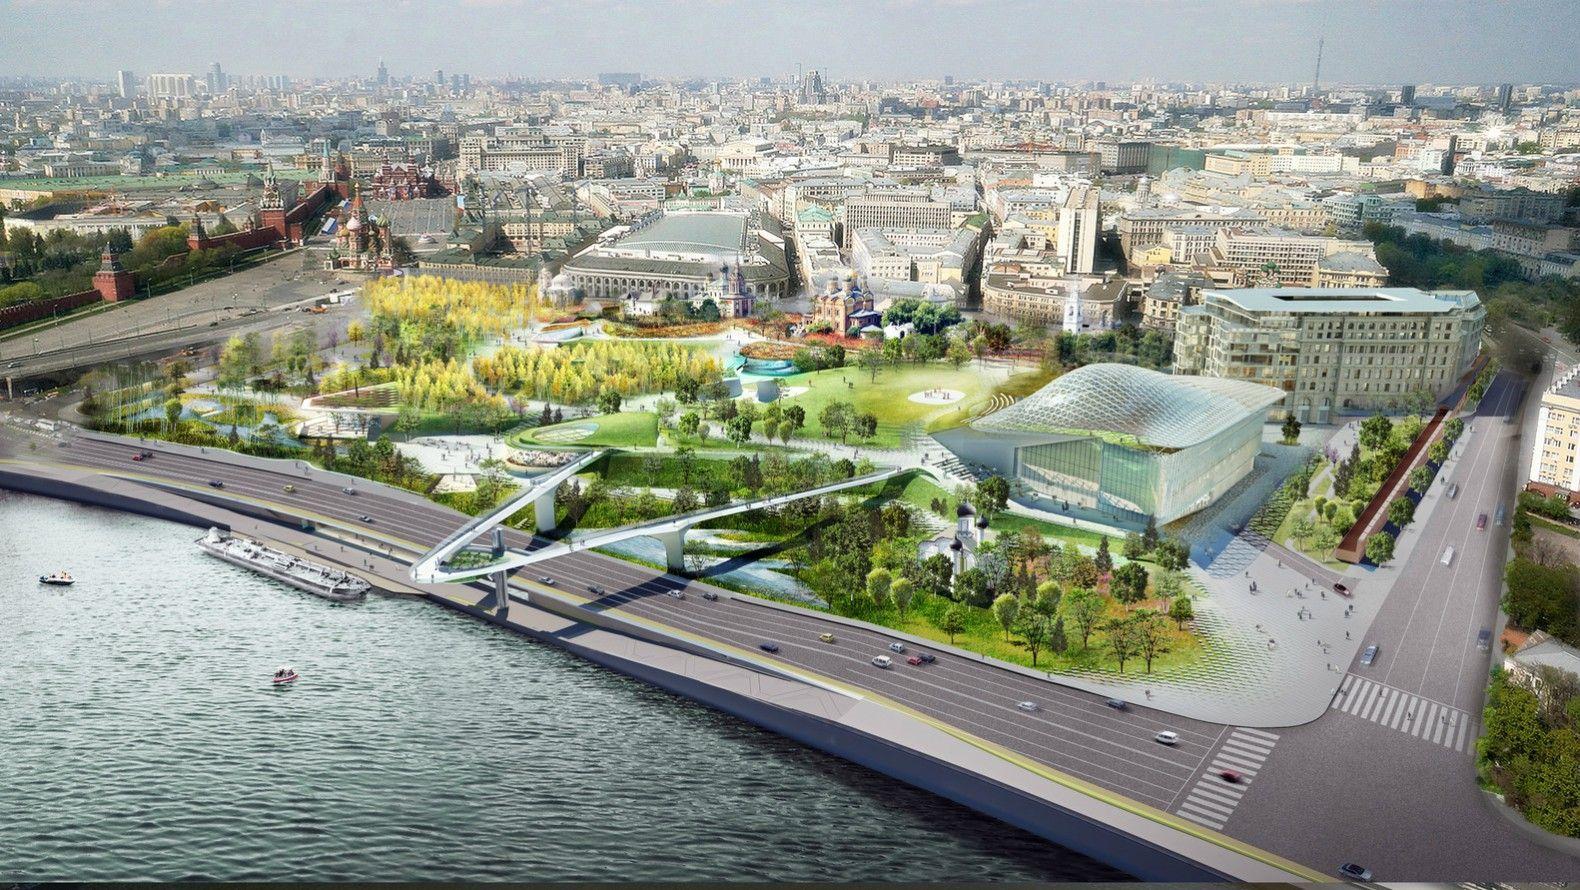 New 35 Acre Public Park Brings Wild Urbanism To Moscow World Architecture Festival Landscape Architecture Design Urban Planning